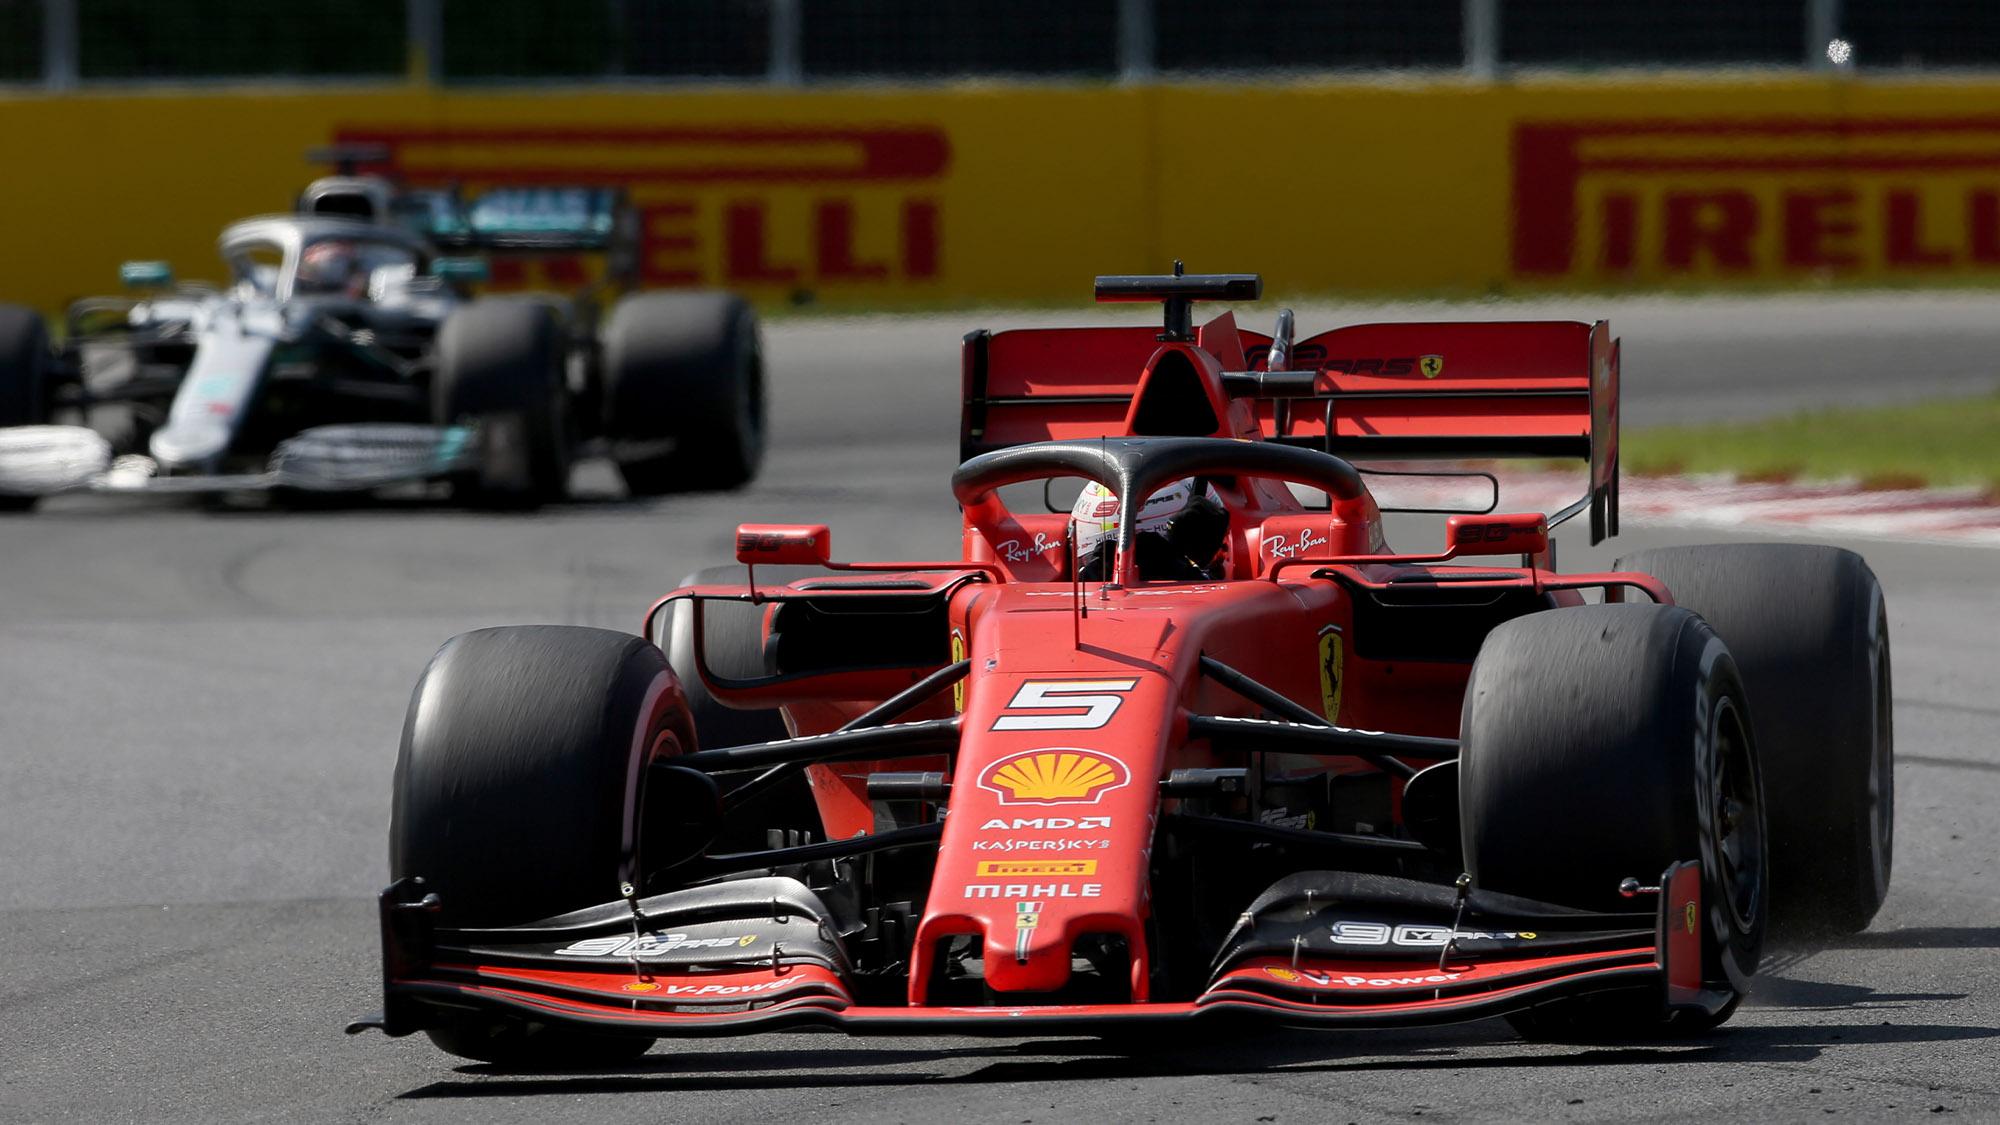 Sebastian Vettel ahead of Lewis Hamilton at the 2019 Canadian Grand Prix